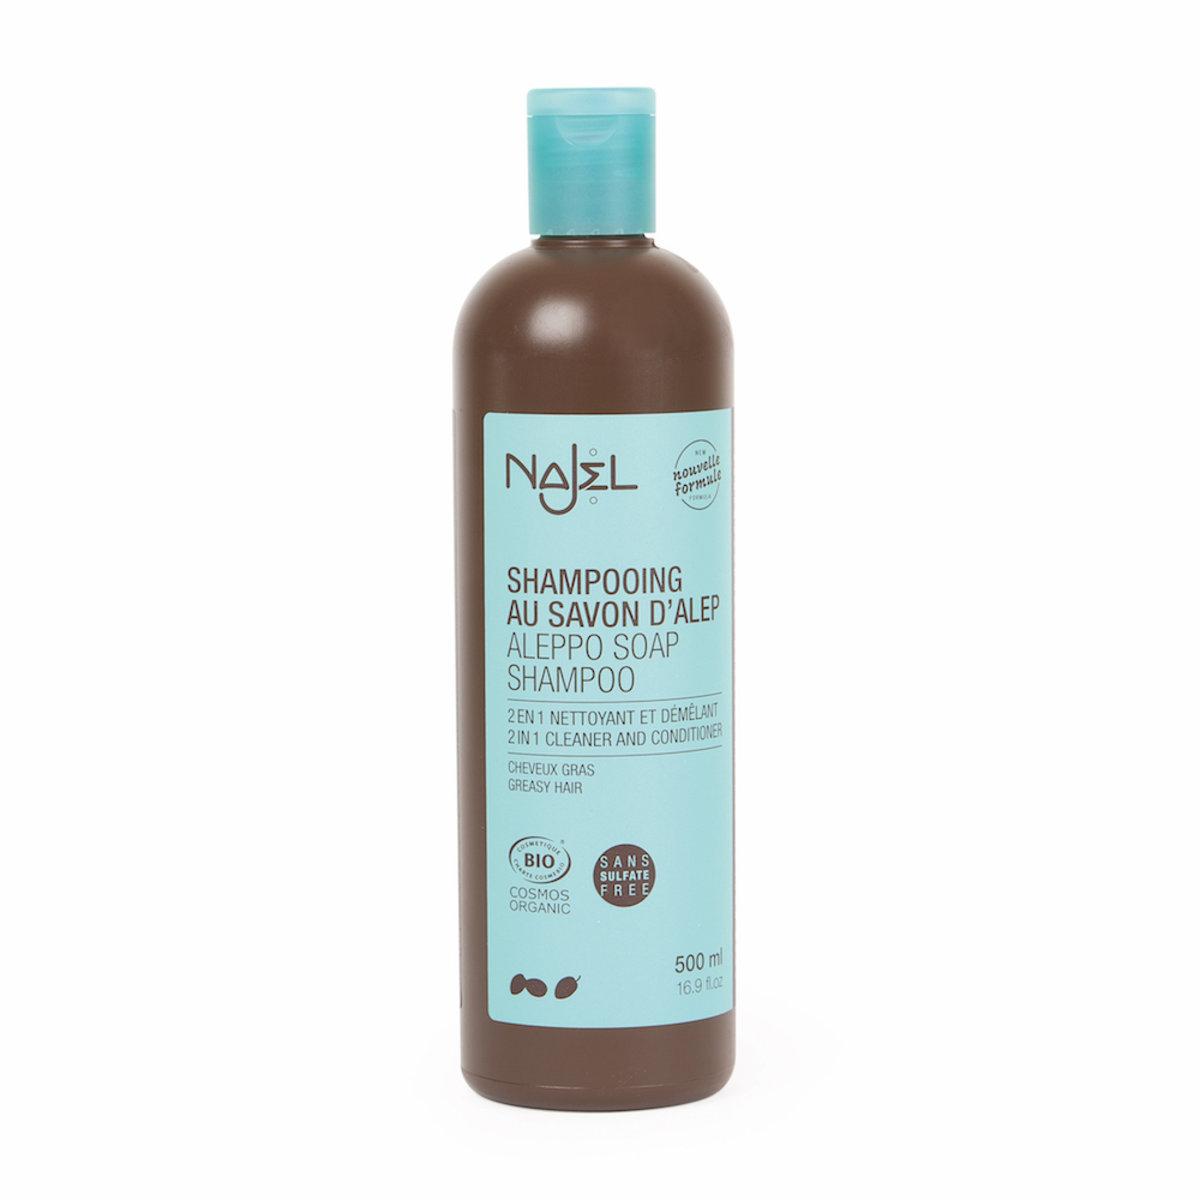 2-in-1 Shampoo & Conditioner (Greasy Hair)